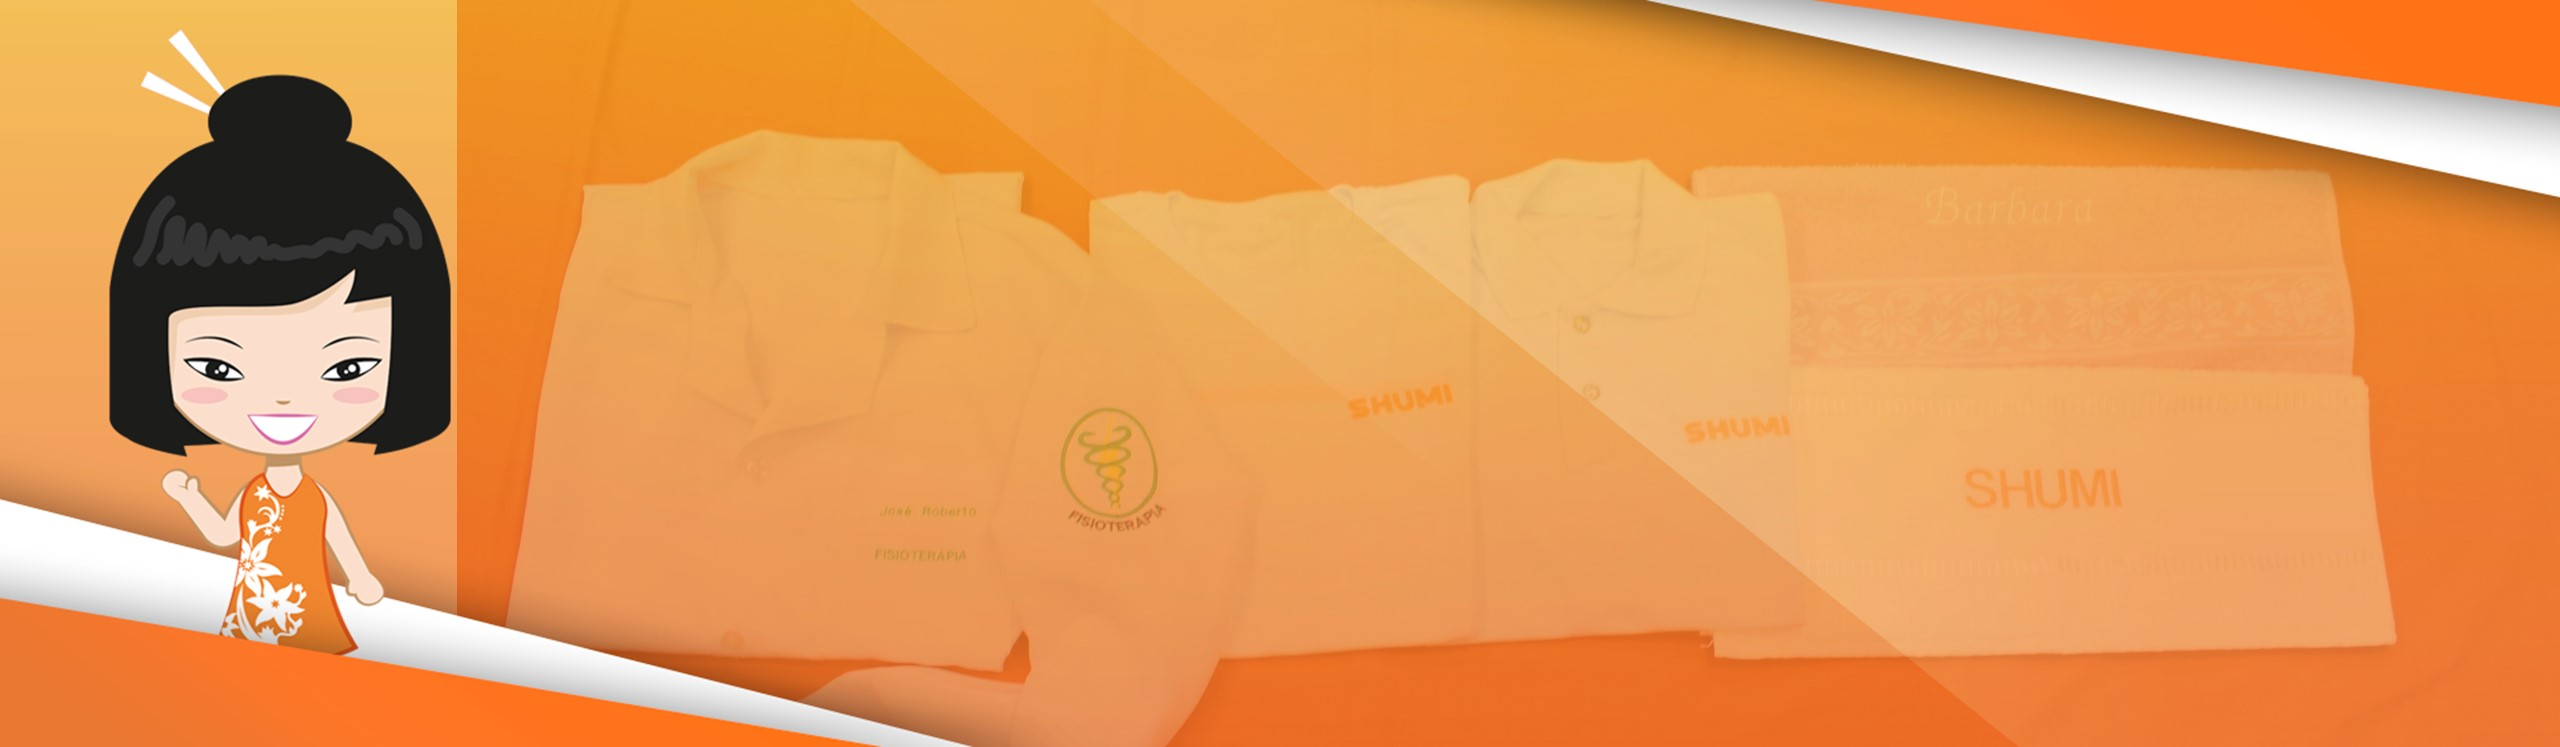 Plataforma banner bordador empreendedor